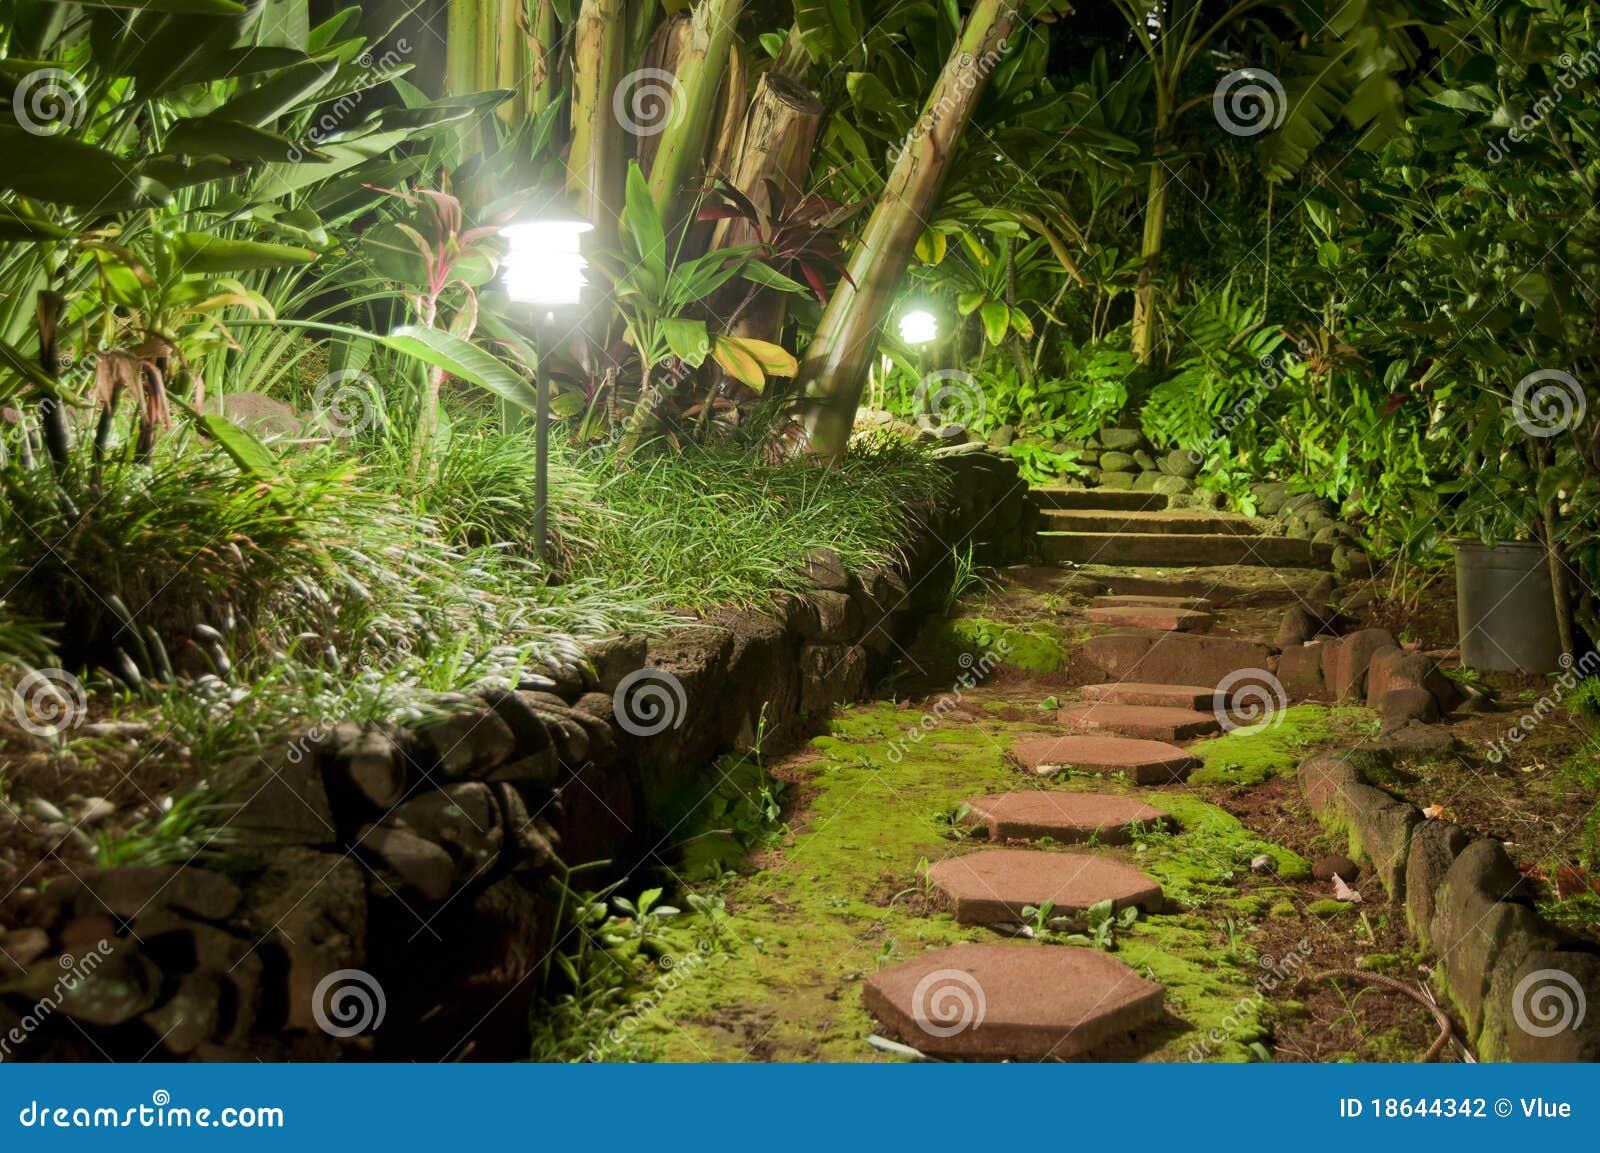 pedra jardim caminho:Garden Pathway at Night